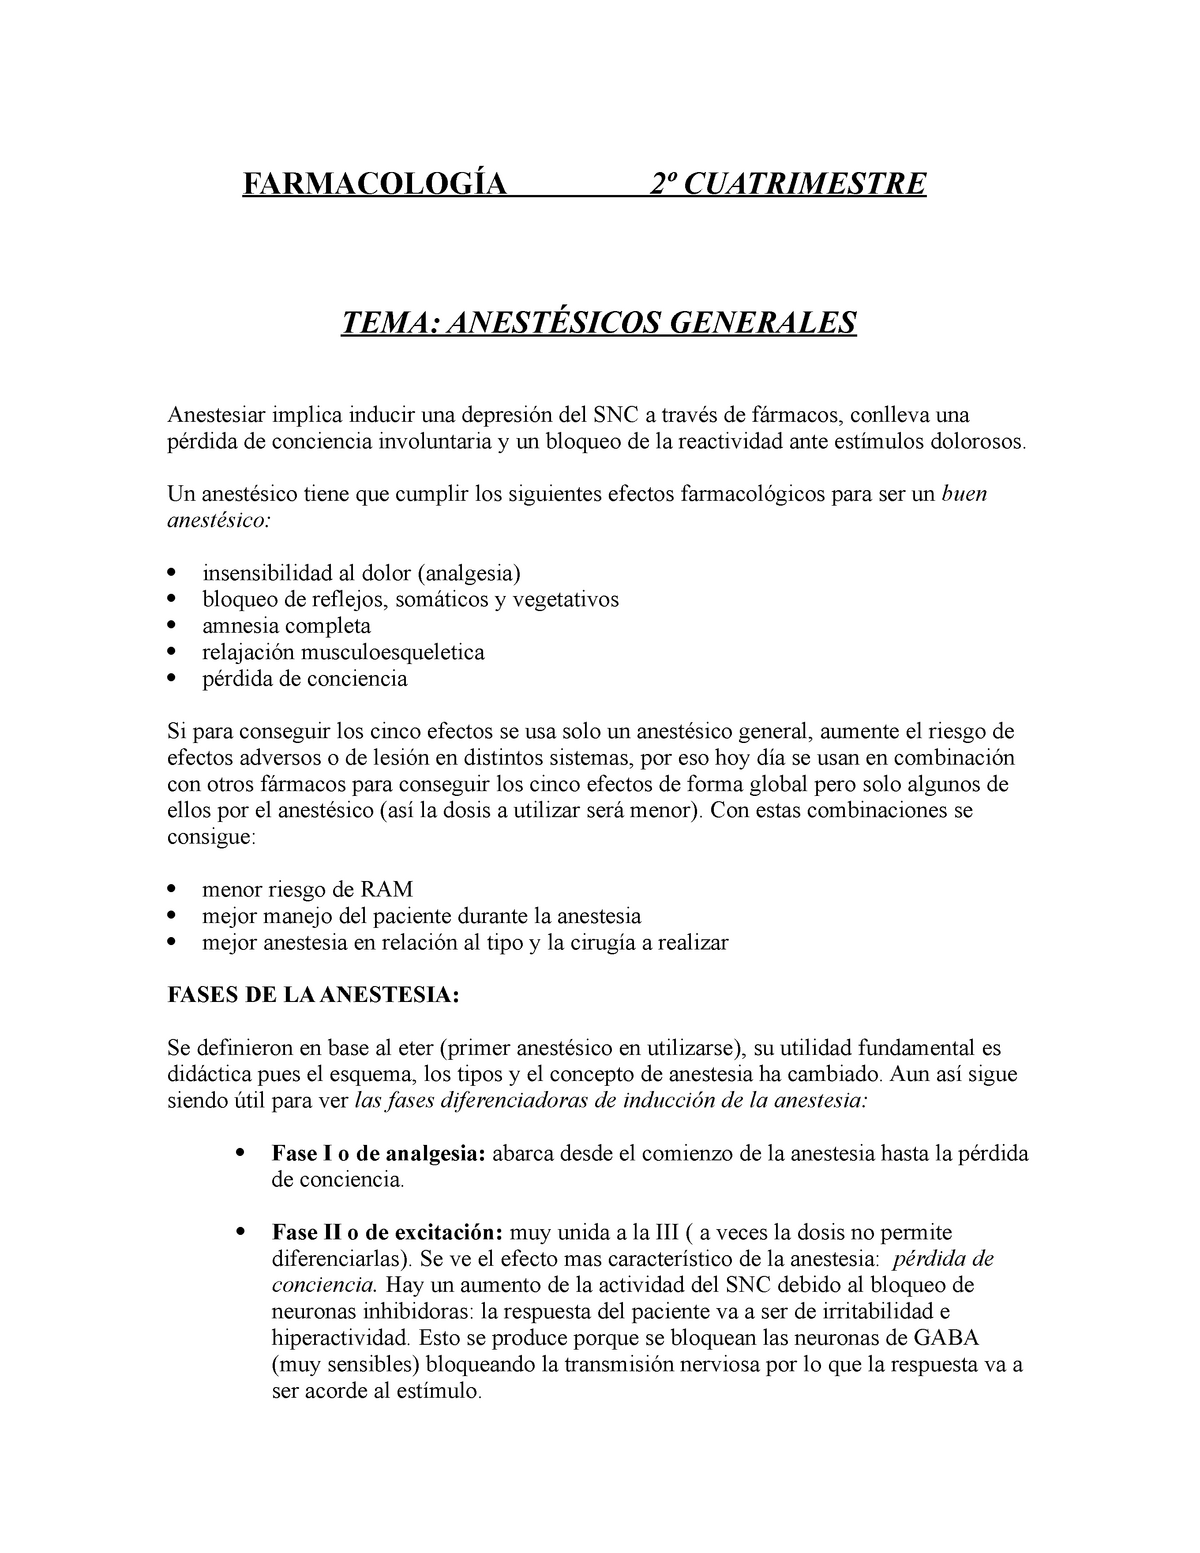 Apuntes Anestesicos Generales - Farmacologia - StuDocu